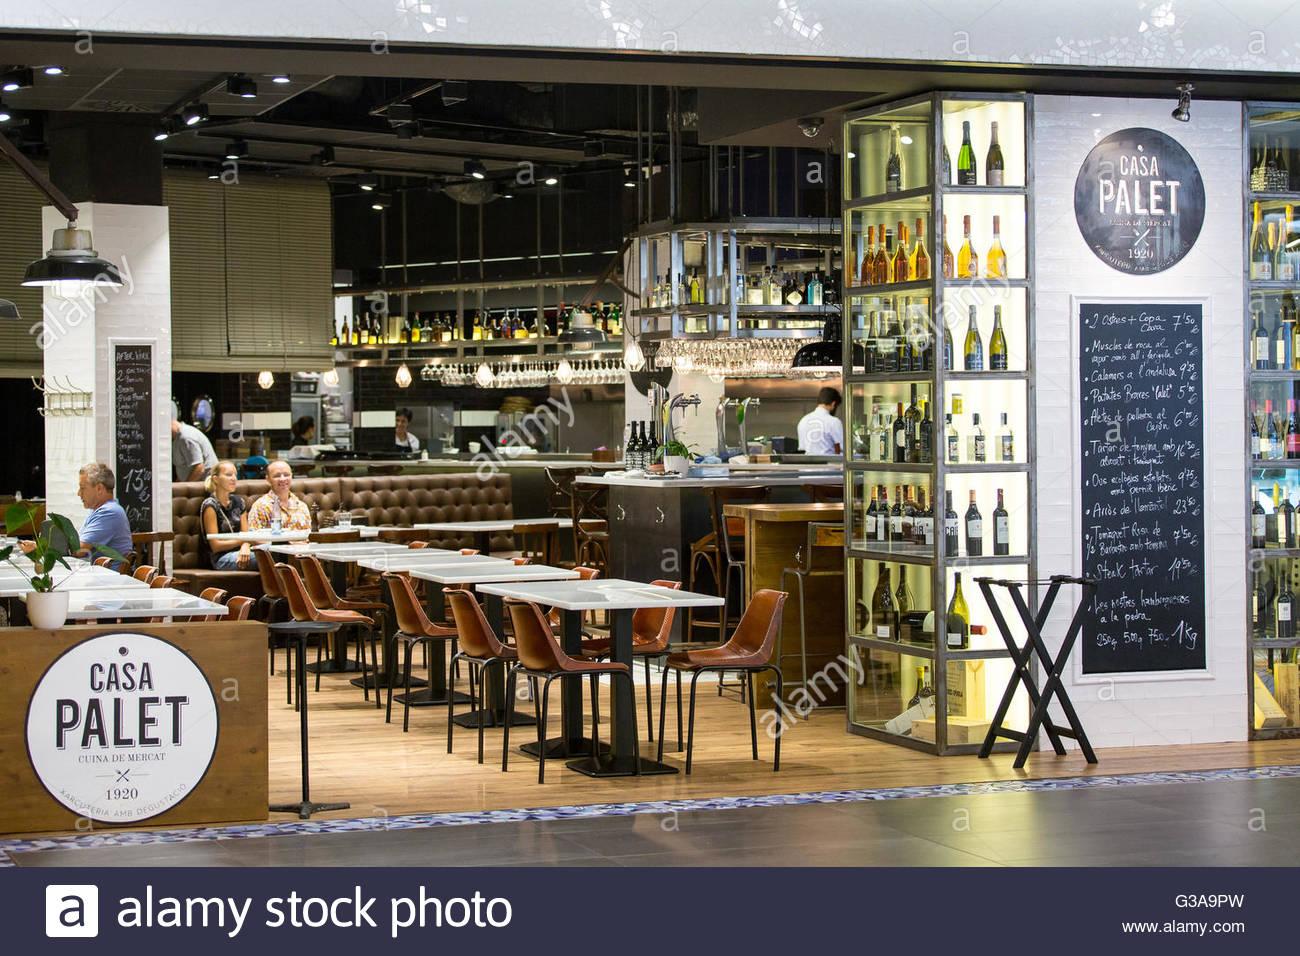 Spain, Catalonia, Barcelona, Mercat des Glories, Casa Palet restaurant - Stock Image